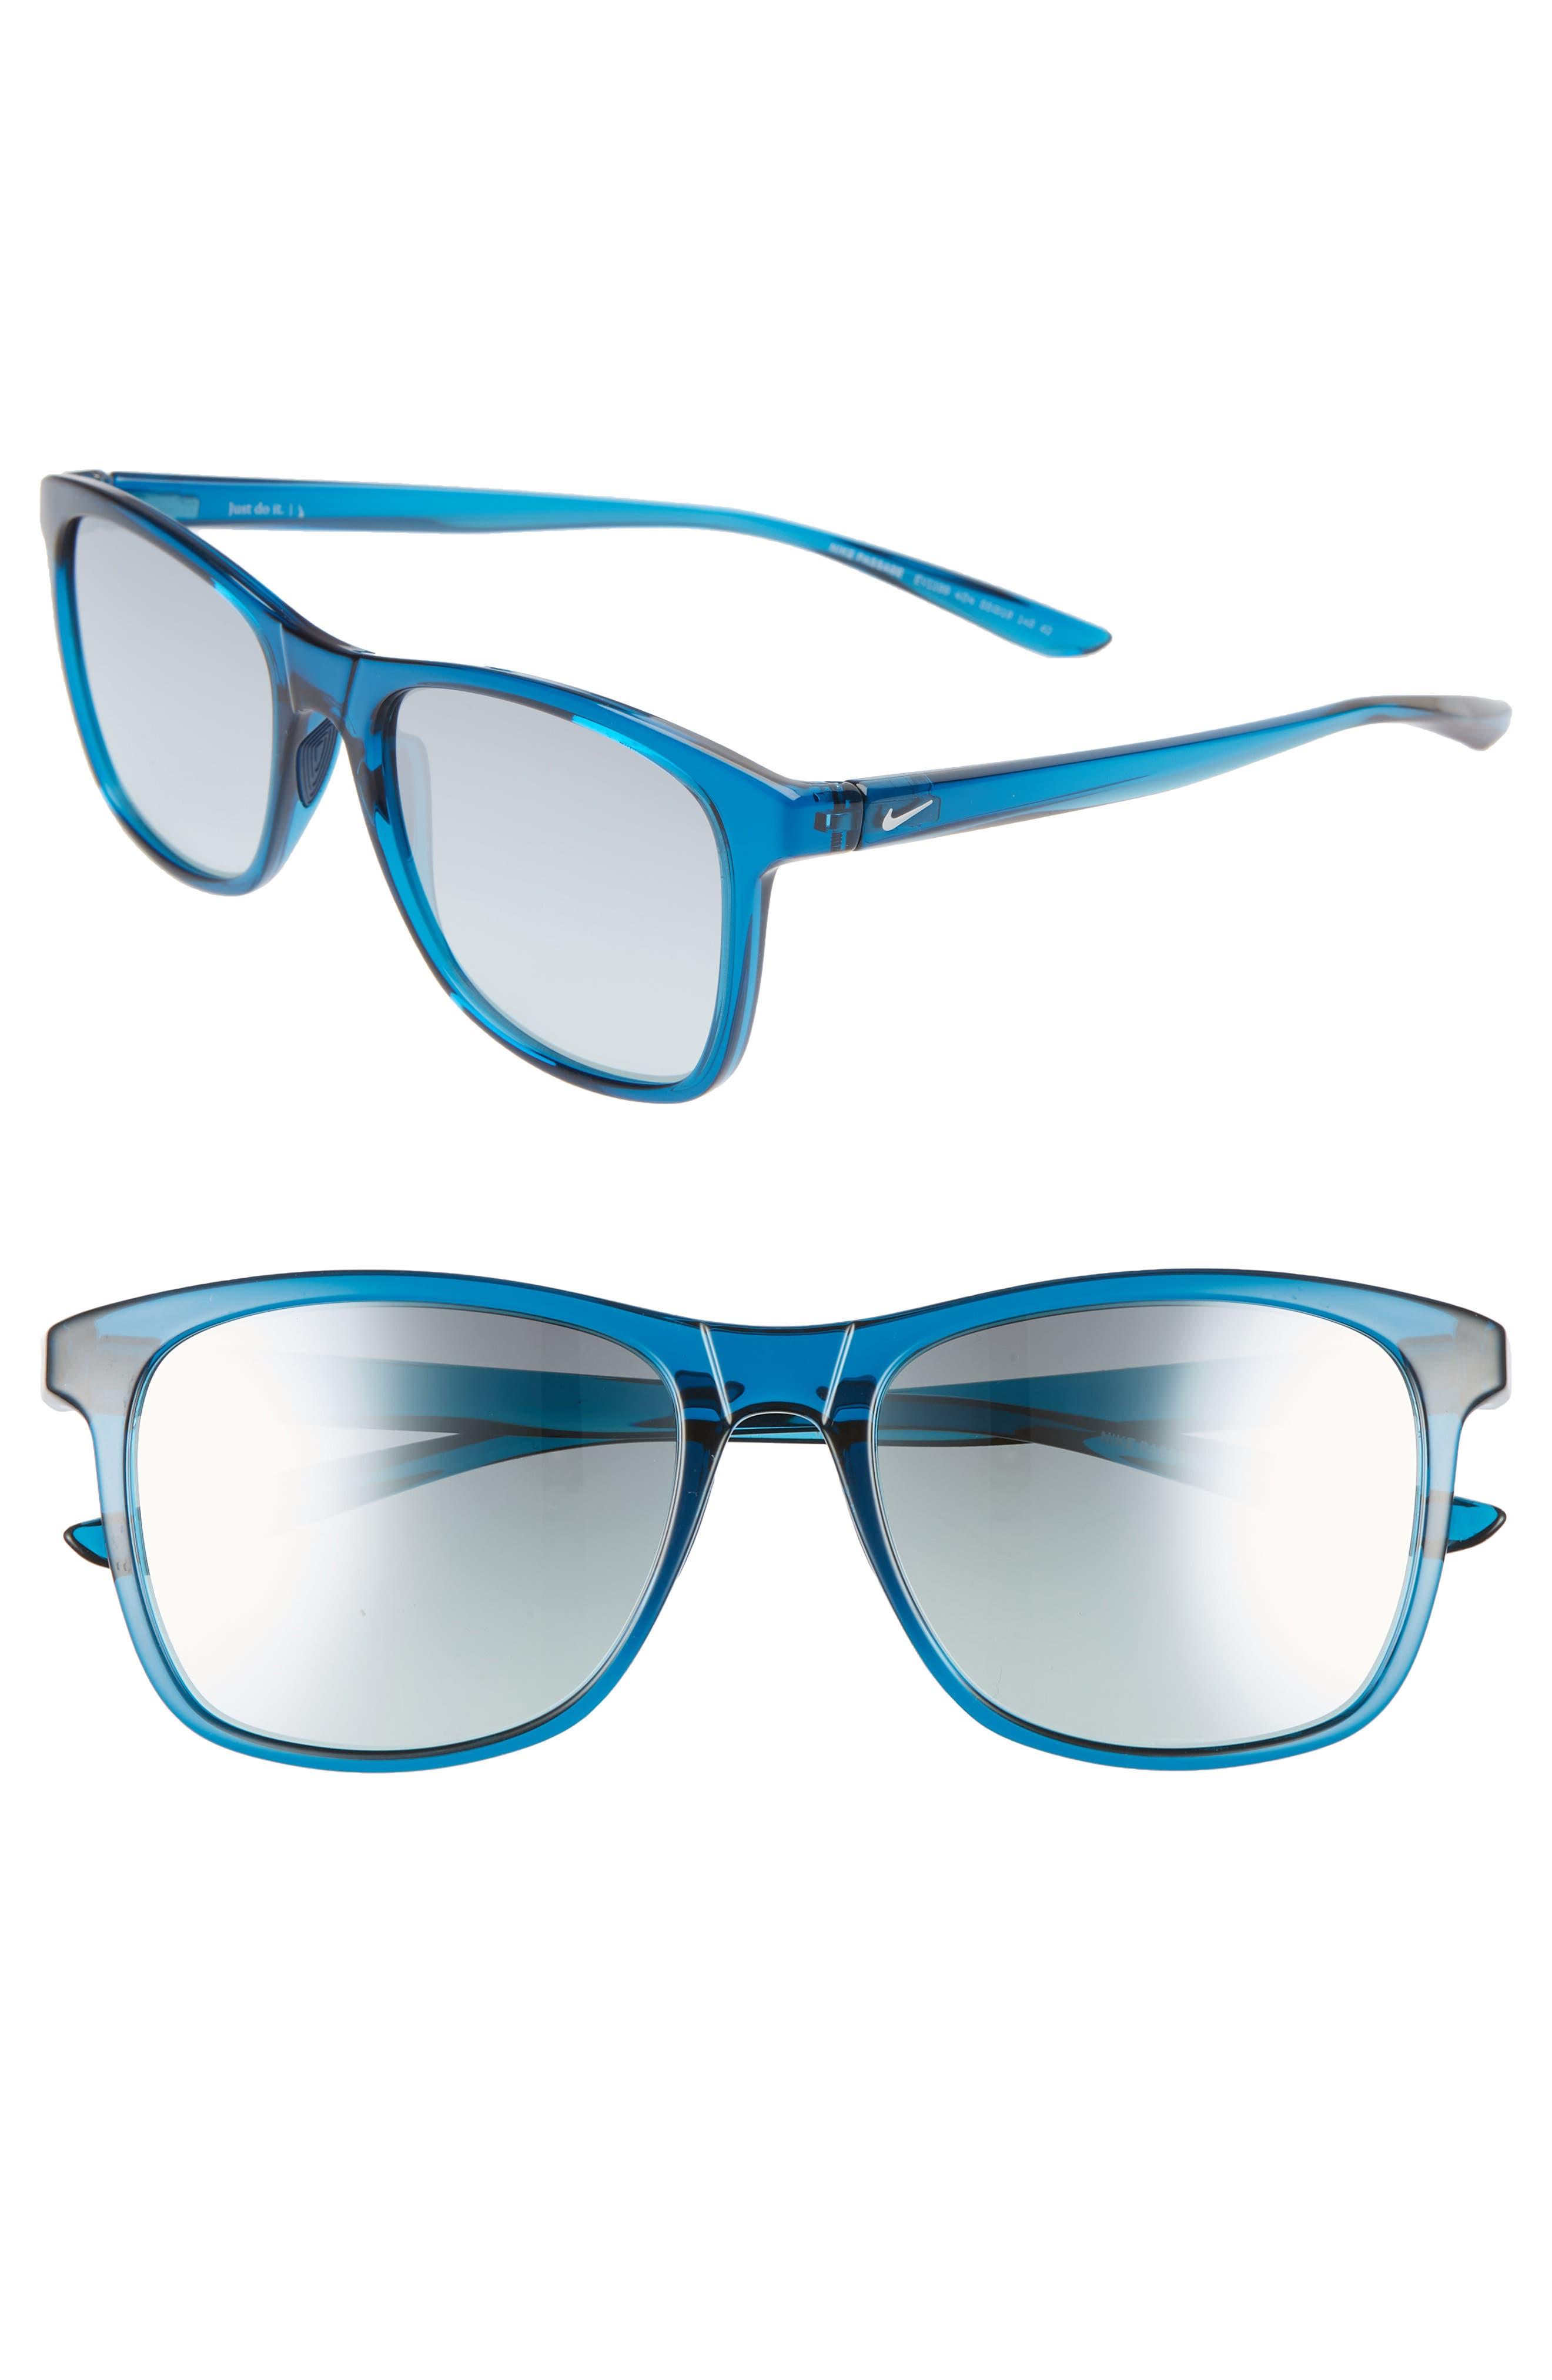 Nike Passage 55Mm Square Sunglasses - Blue Force/ Blue